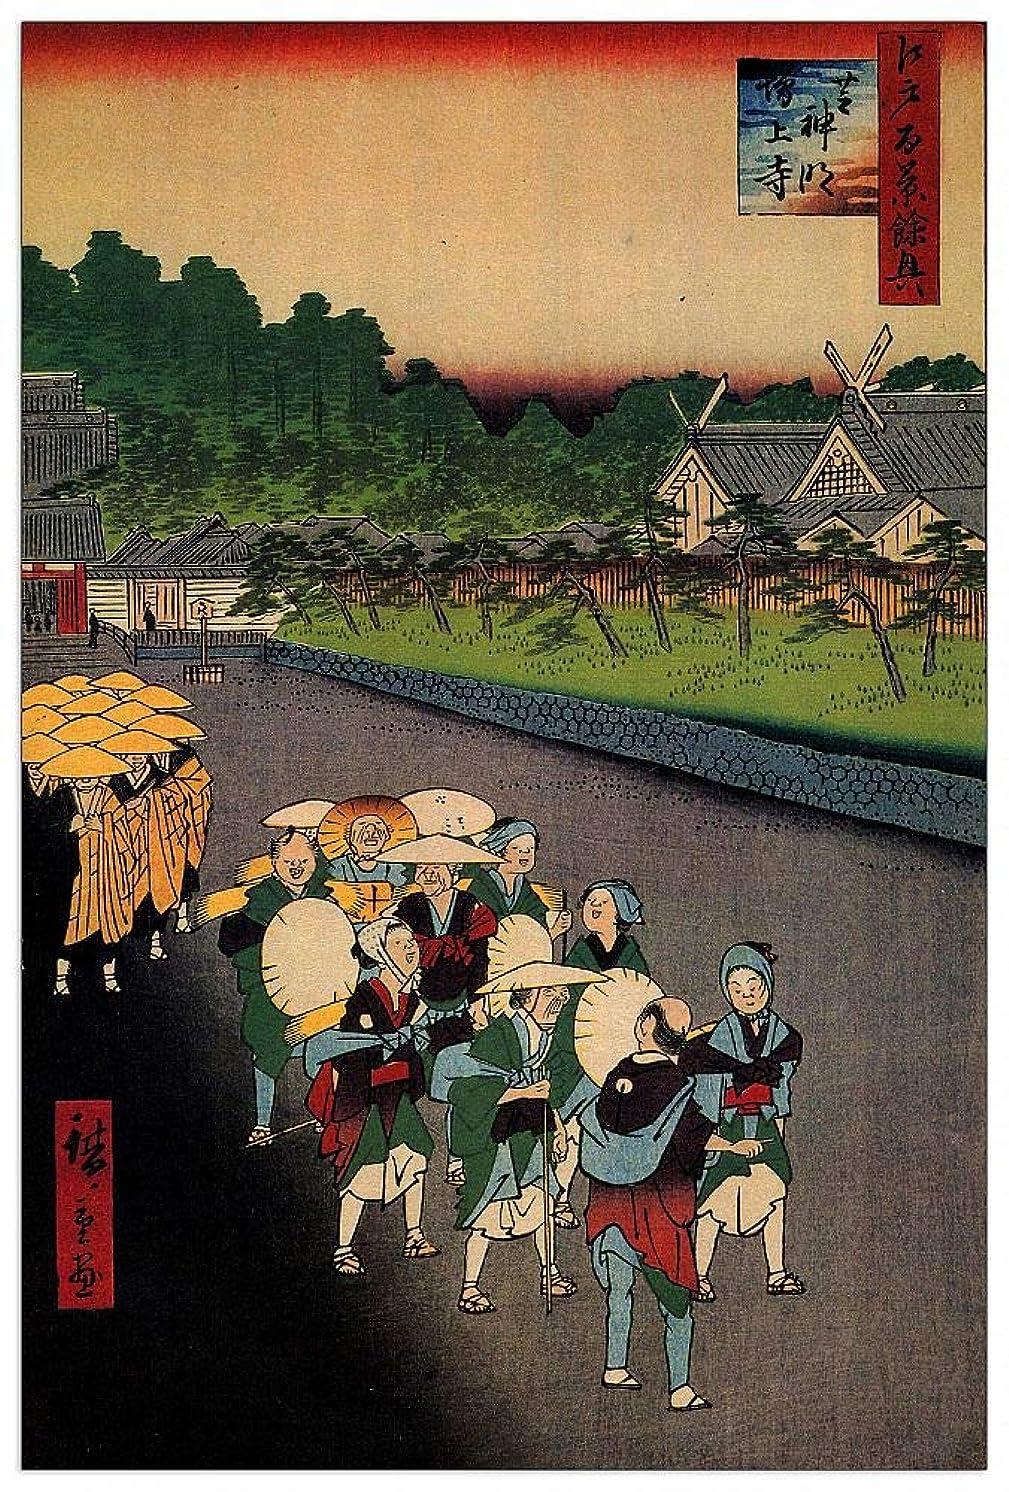 ArtPlaza TW92956 Hiroshige Utagawa - Shiba Shinmei Shrine Decorative Panel 27.5x39.5 Inch Multicolored